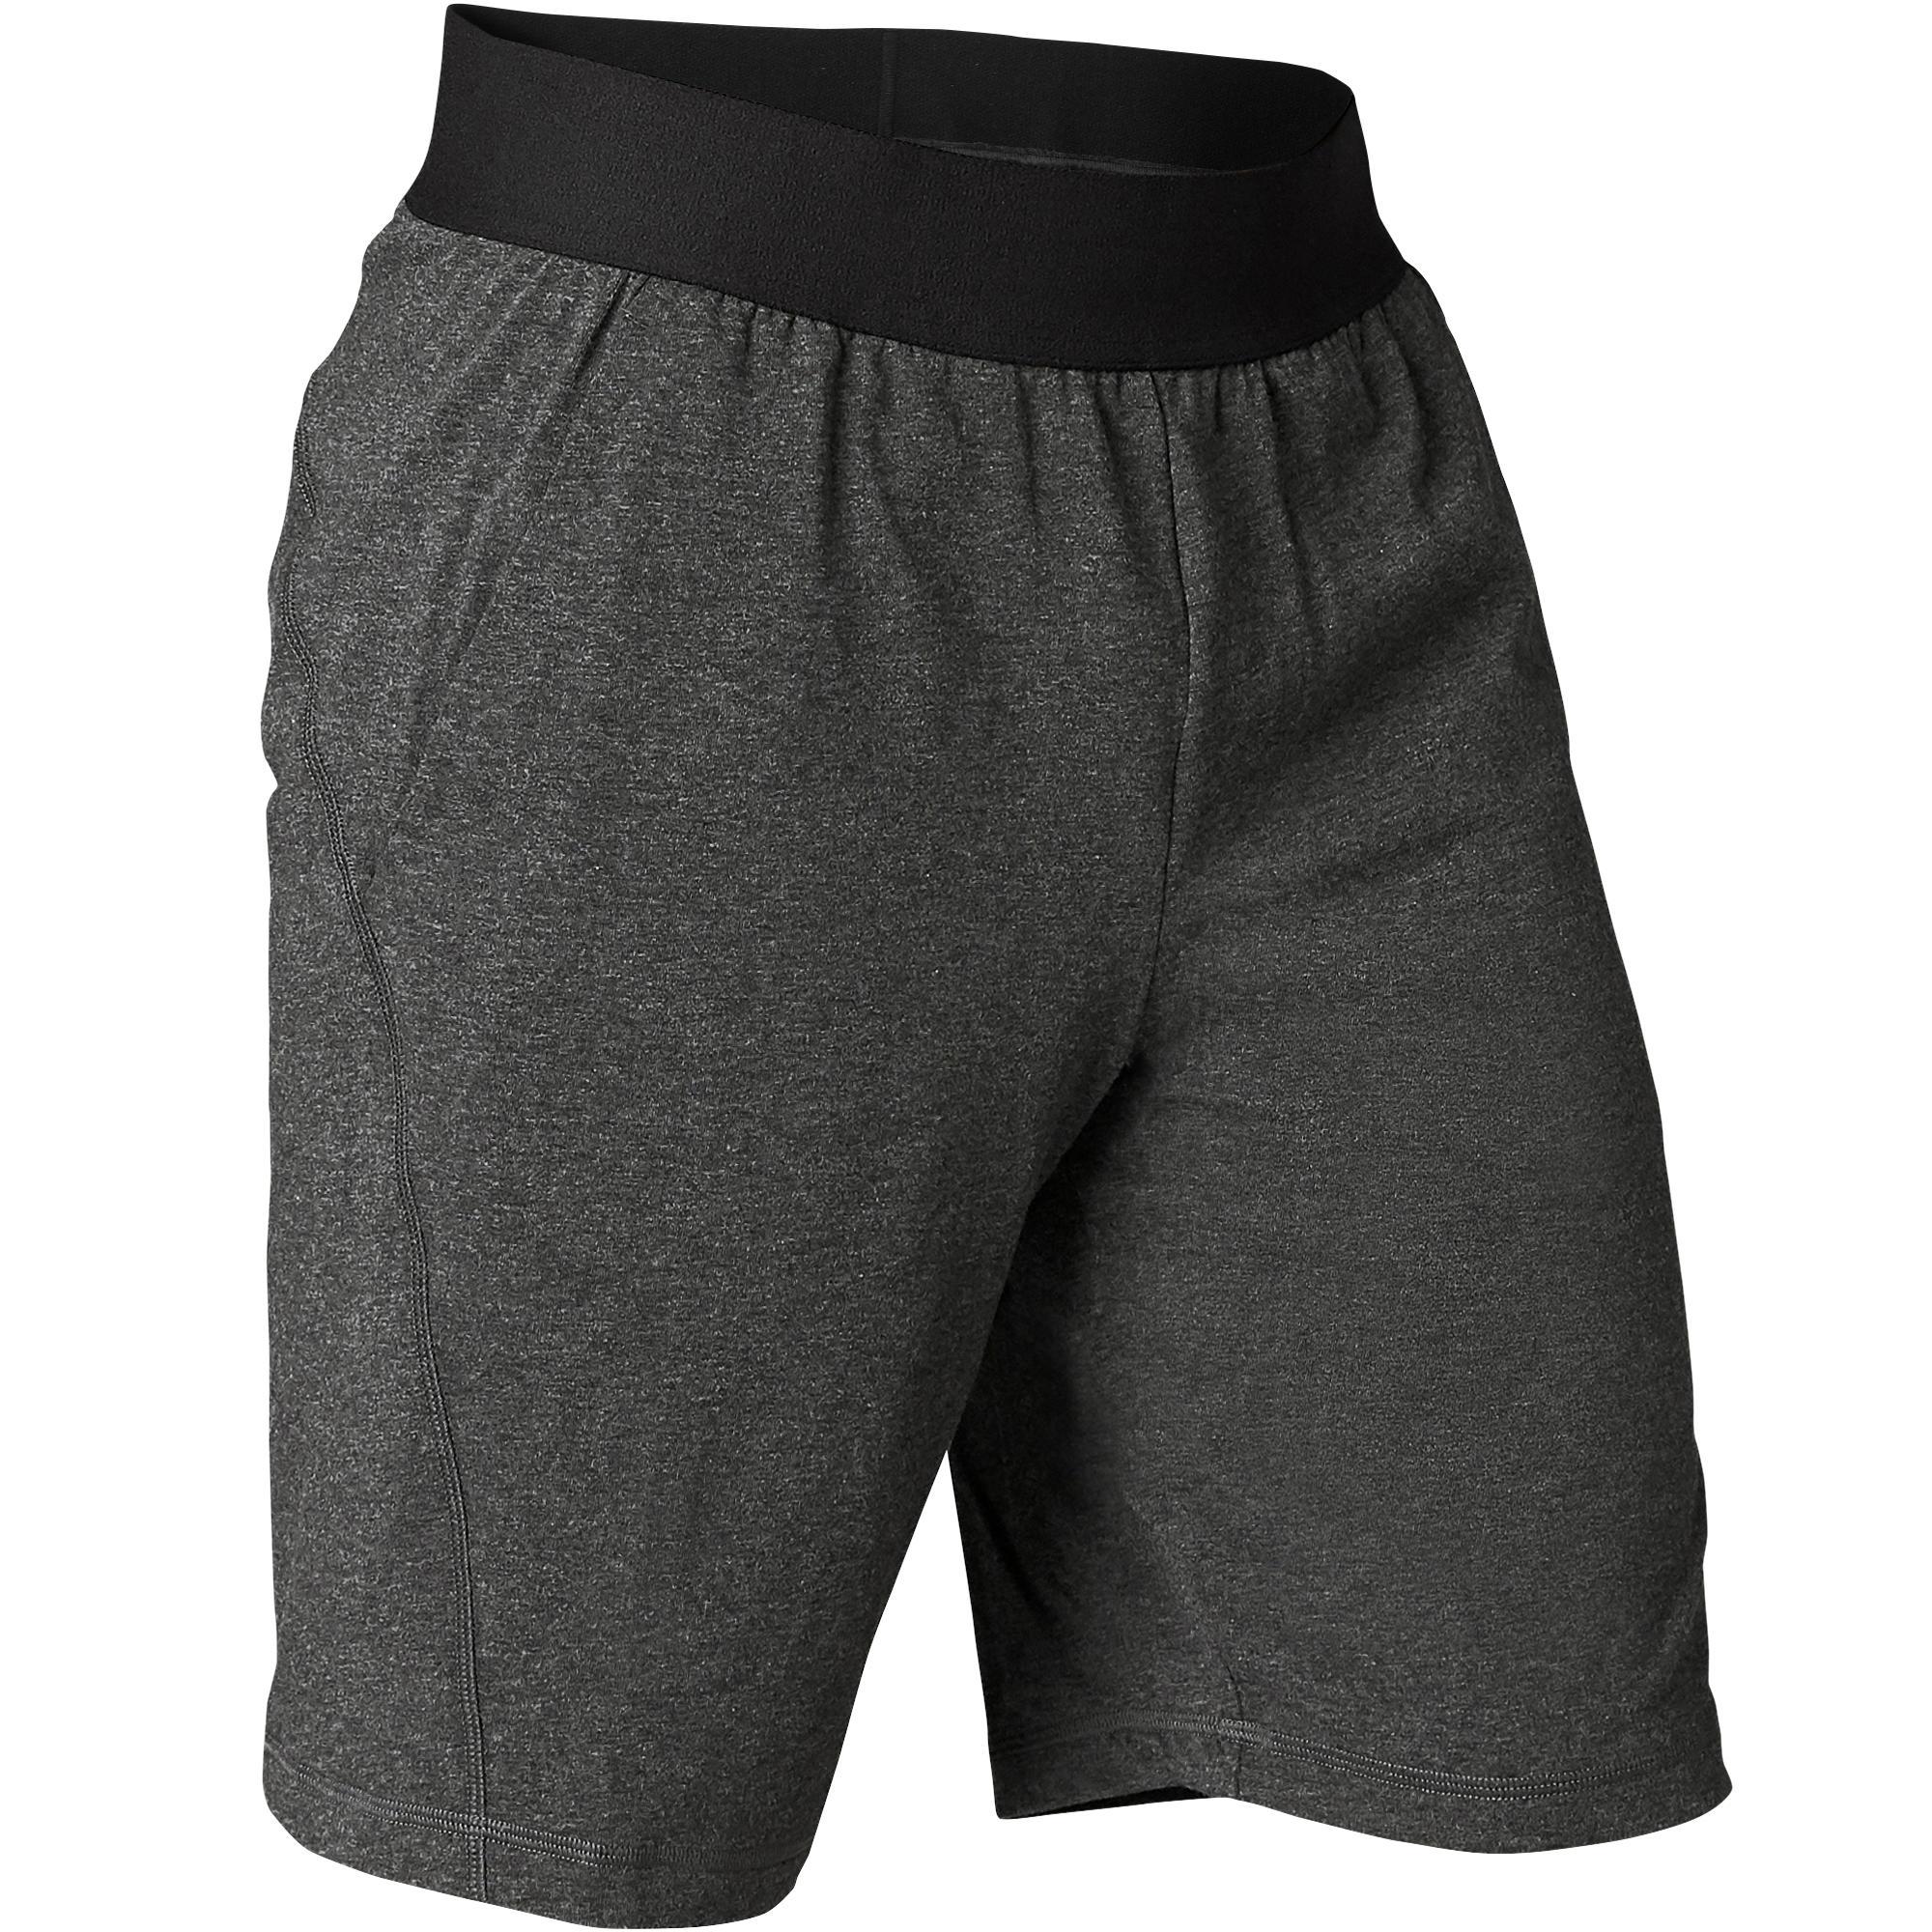 Comprar ropa de yoga para hombre decathlon jpg 2000x2000 Pilates ropa para  hacer yoga decathlon 96edd38dab07